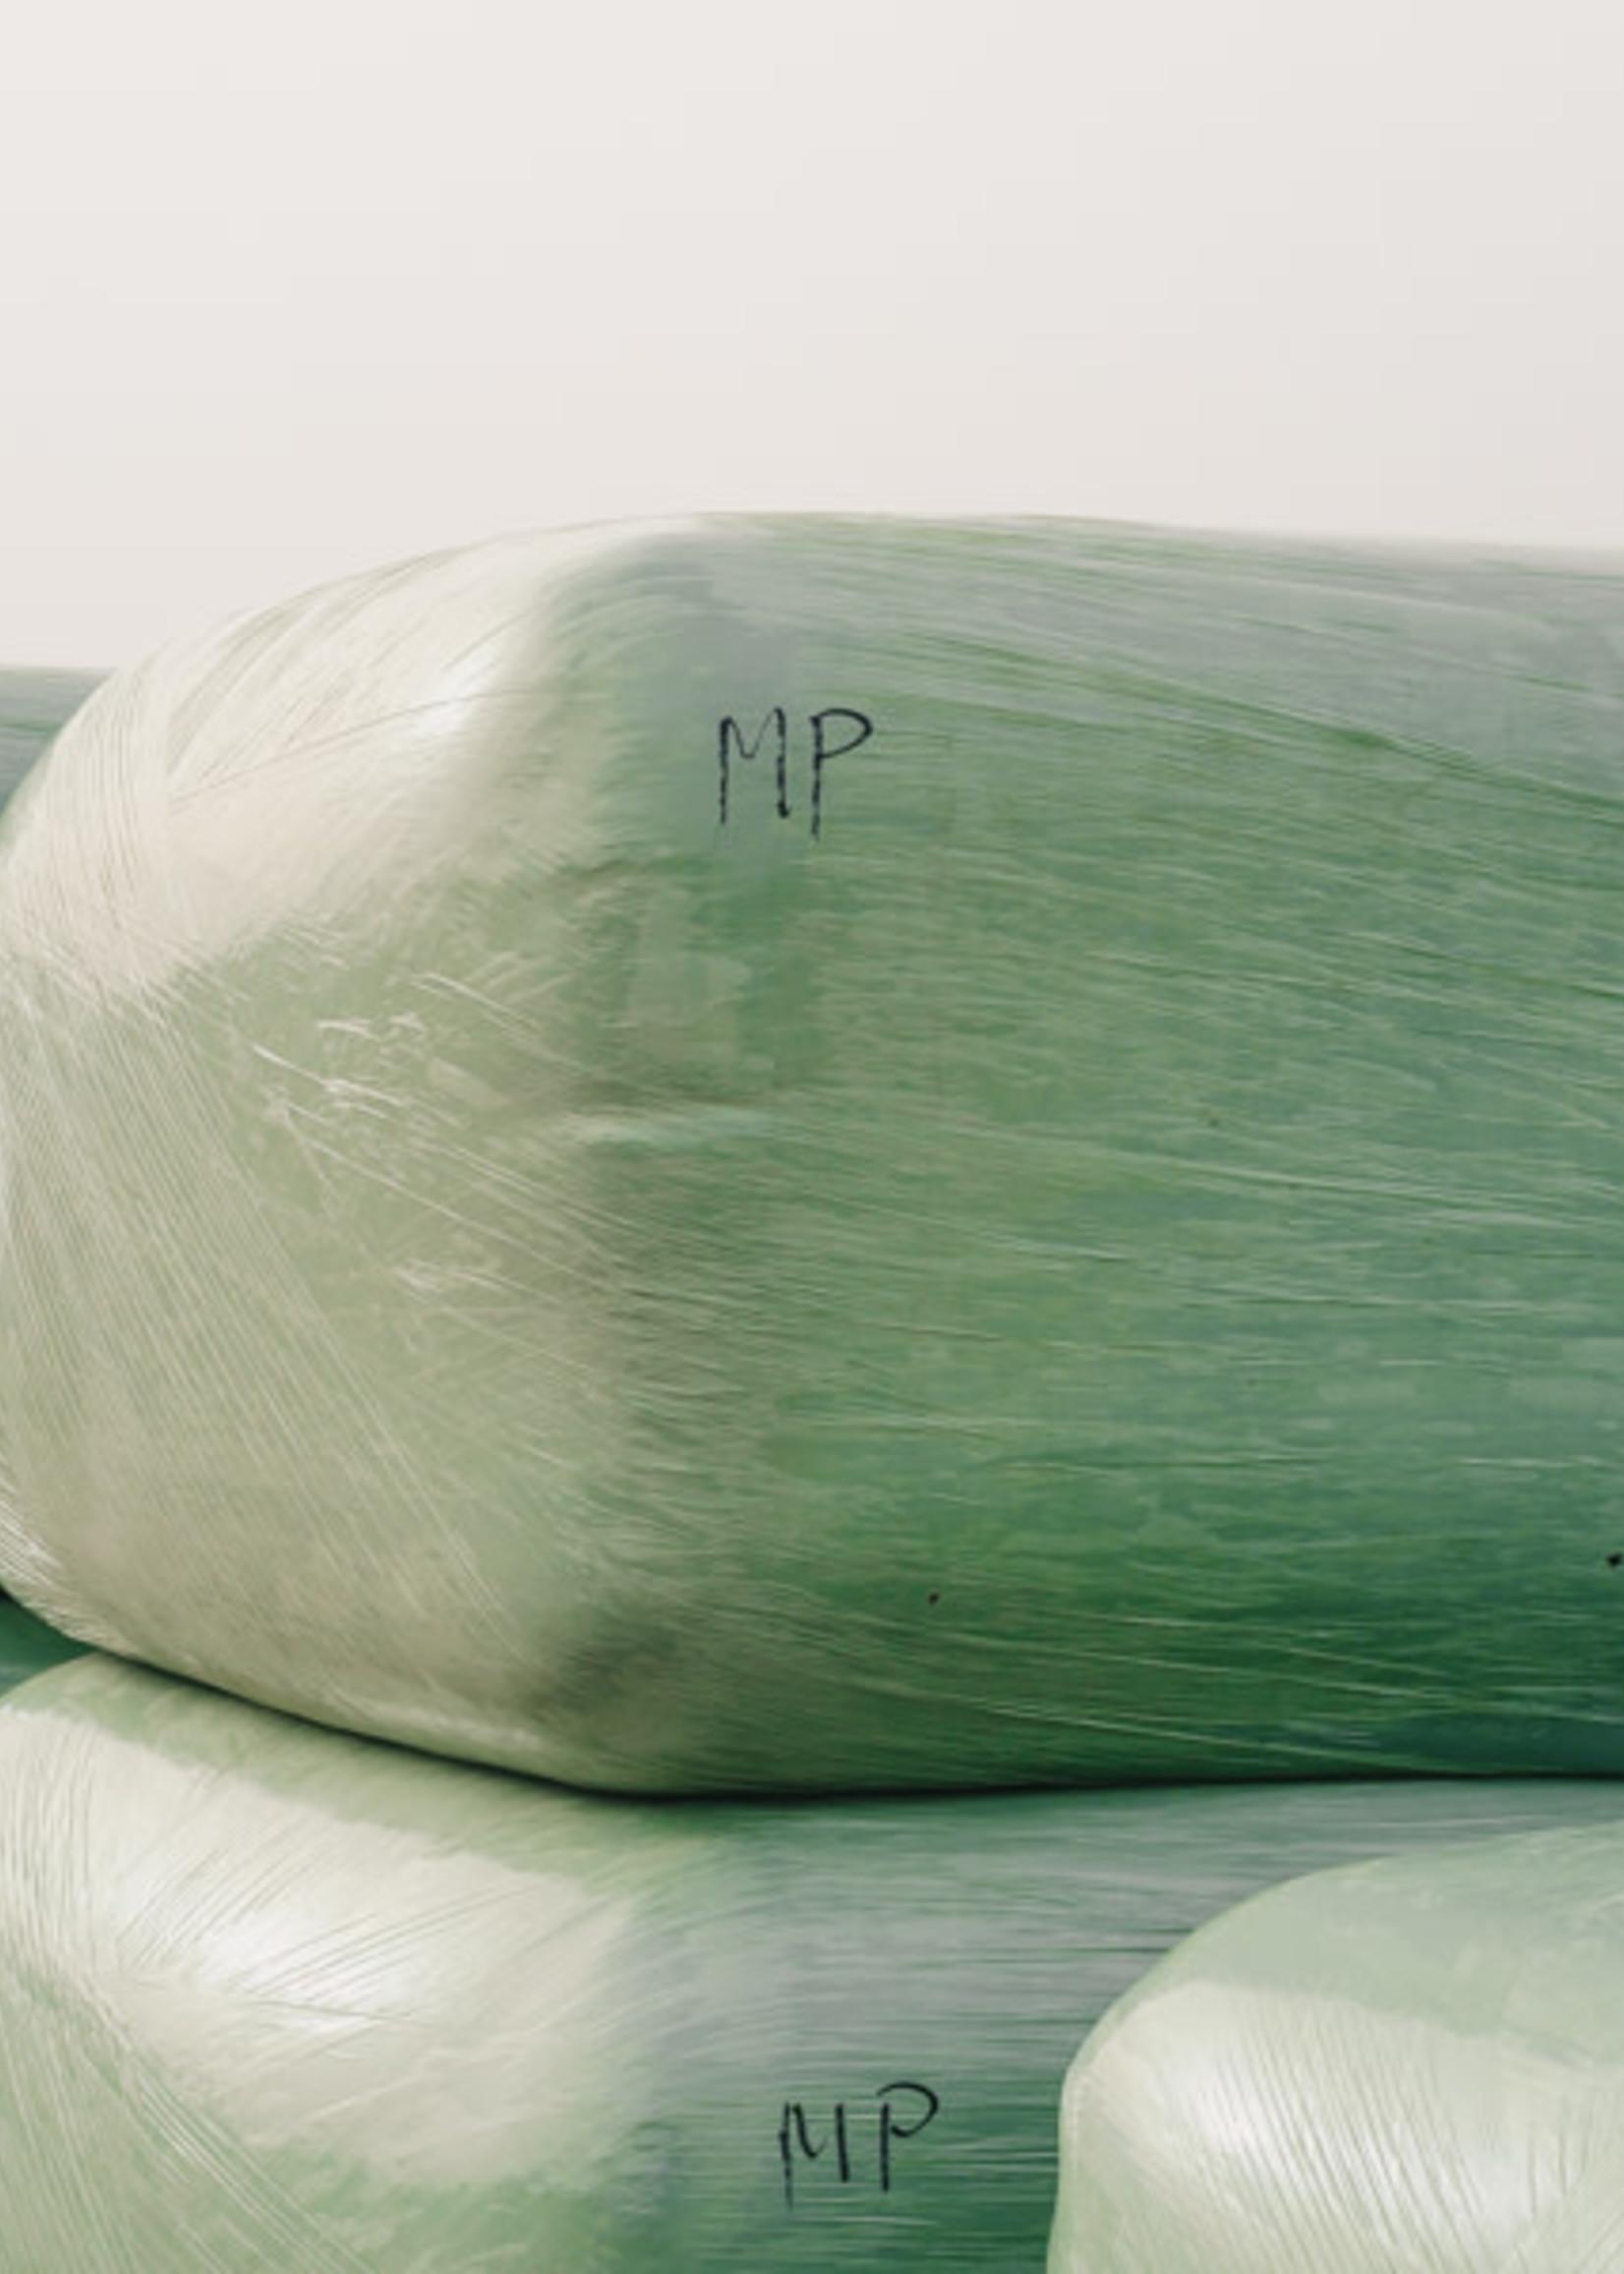 De Hagendoorn Maïs pulp 650 kg